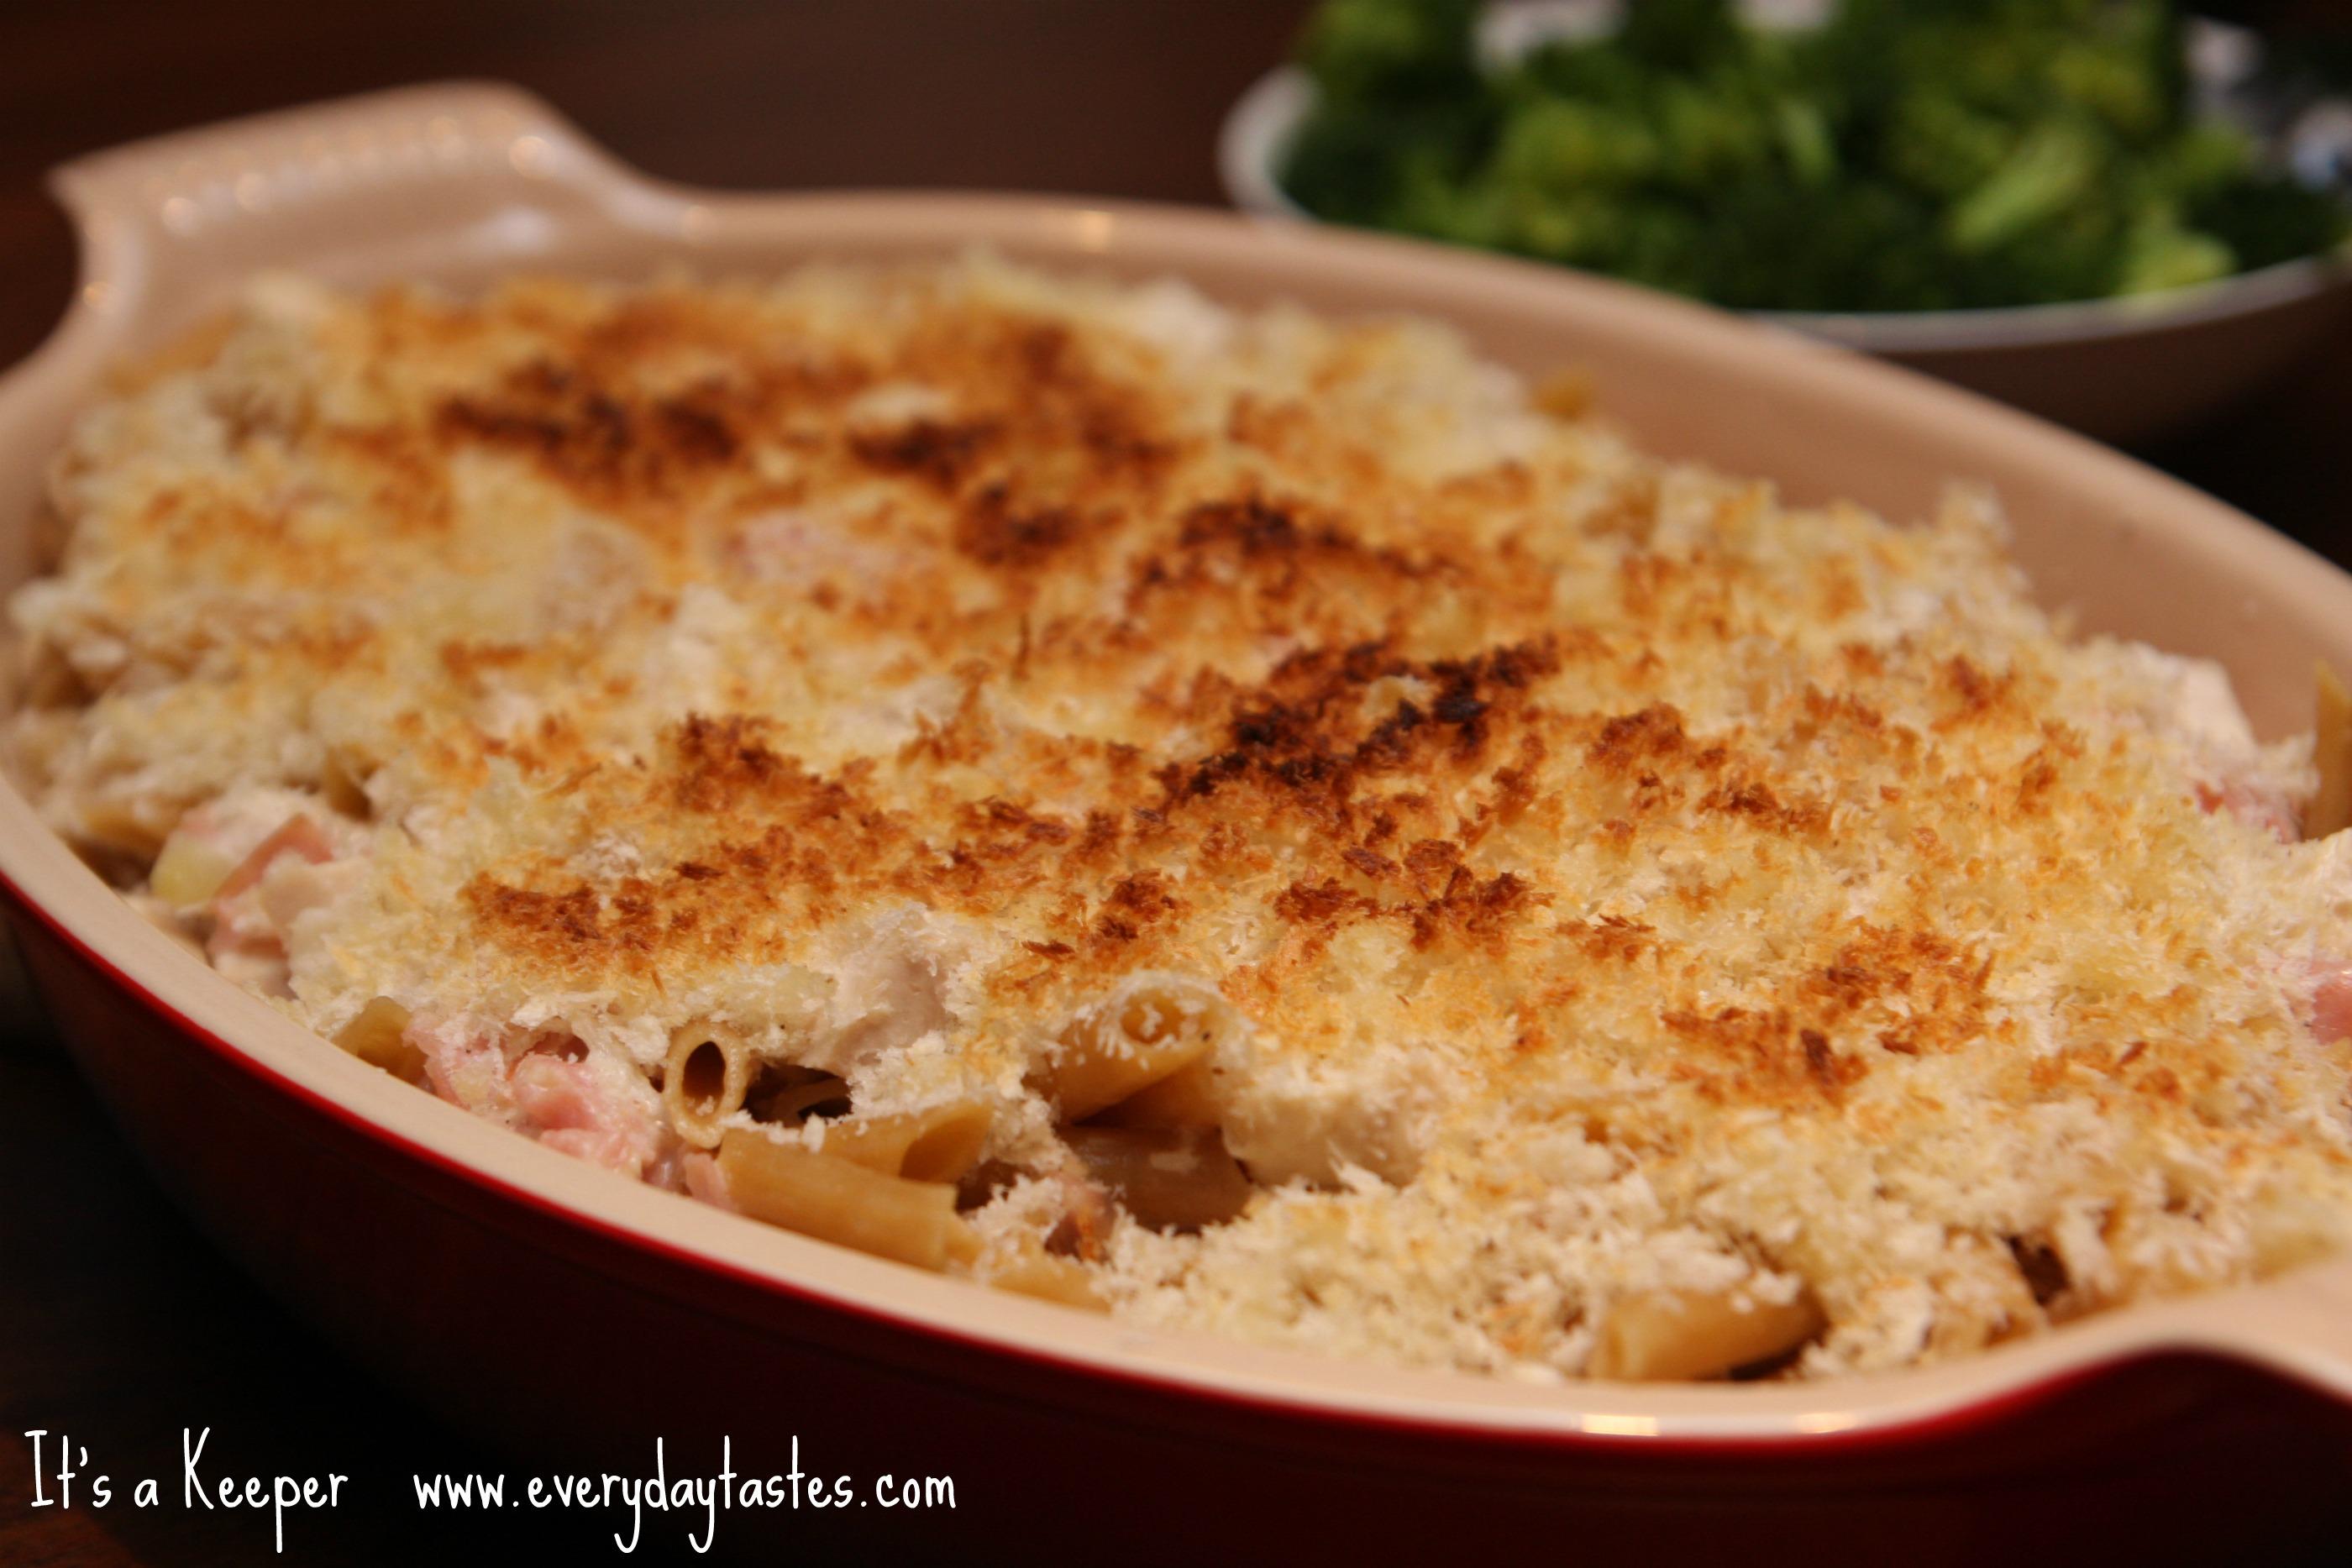 Pasta Cordon Bleu It's a Keeper